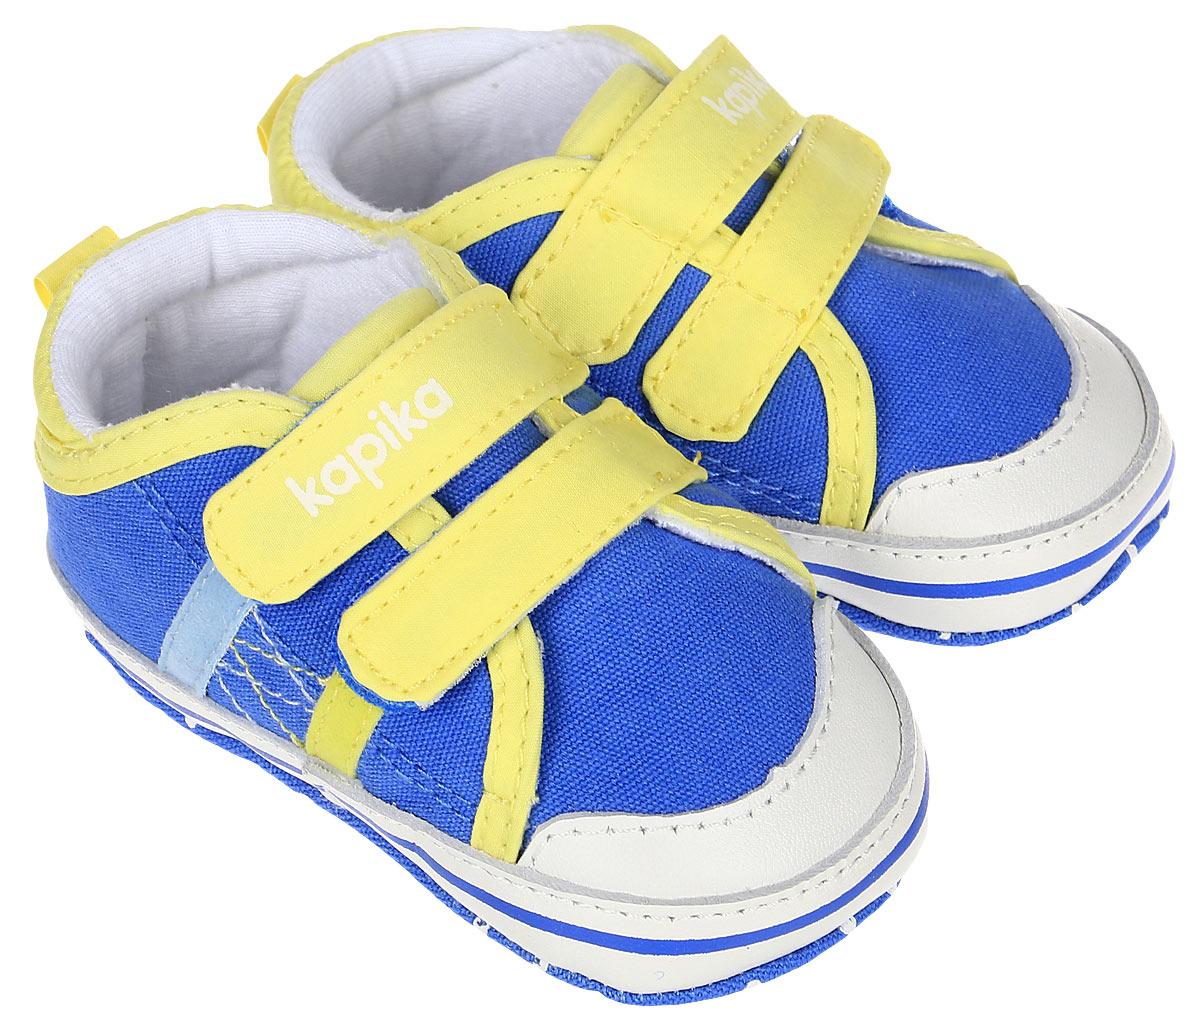 Пинетки для мальчика Kapika, цвет: голубой, желтый. 10128. Размер 18 пинетки митенки blue penguin puku